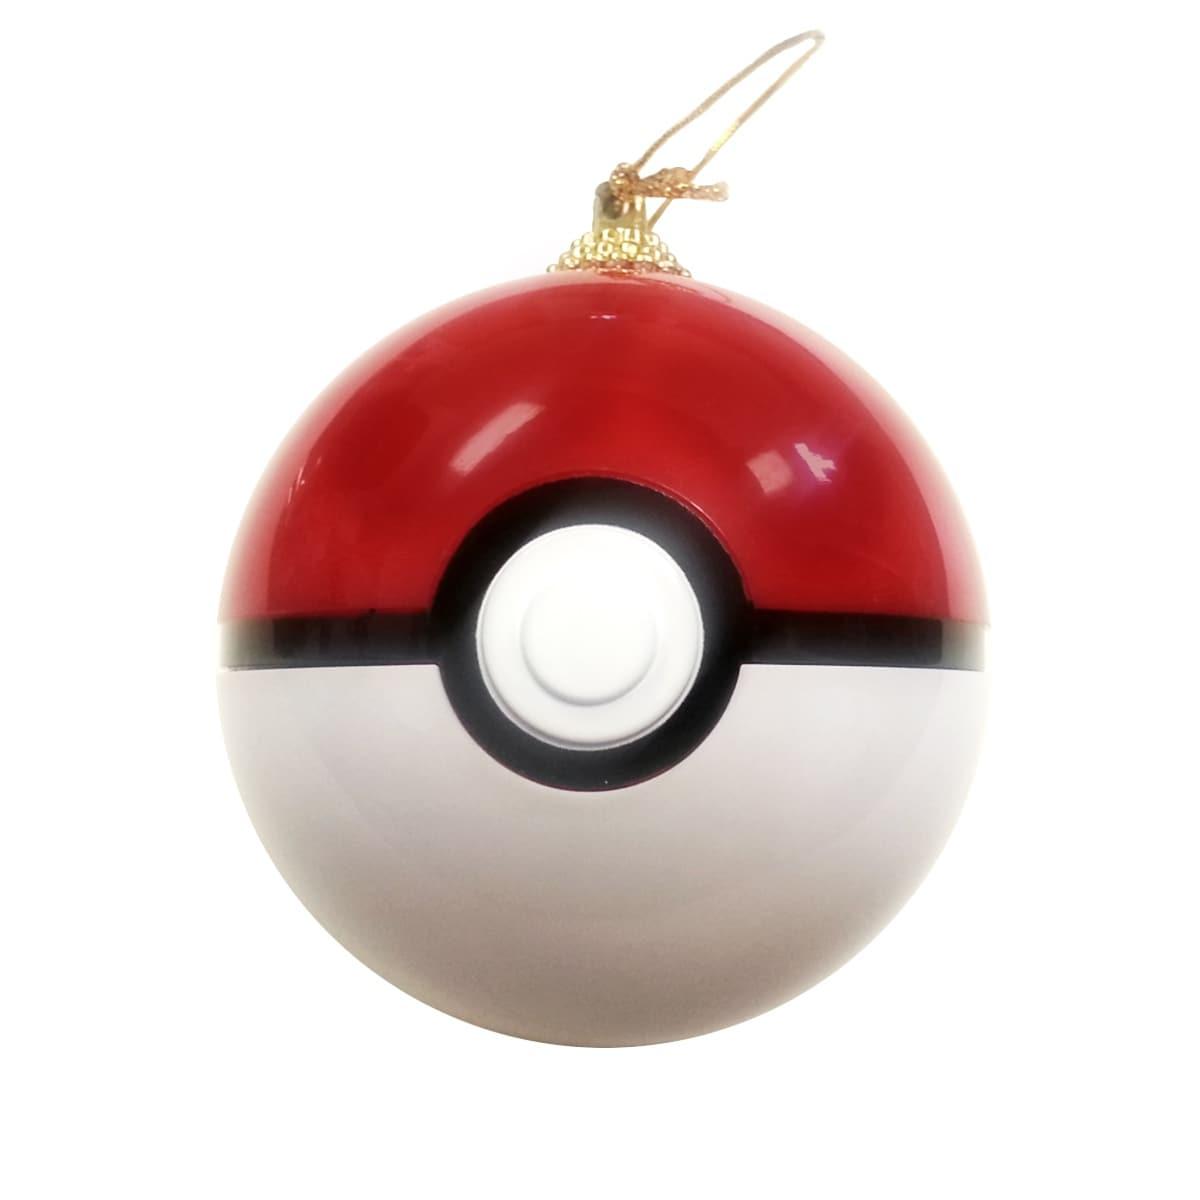 Pokeball Christmas Tree Ornament. Opens flyout.